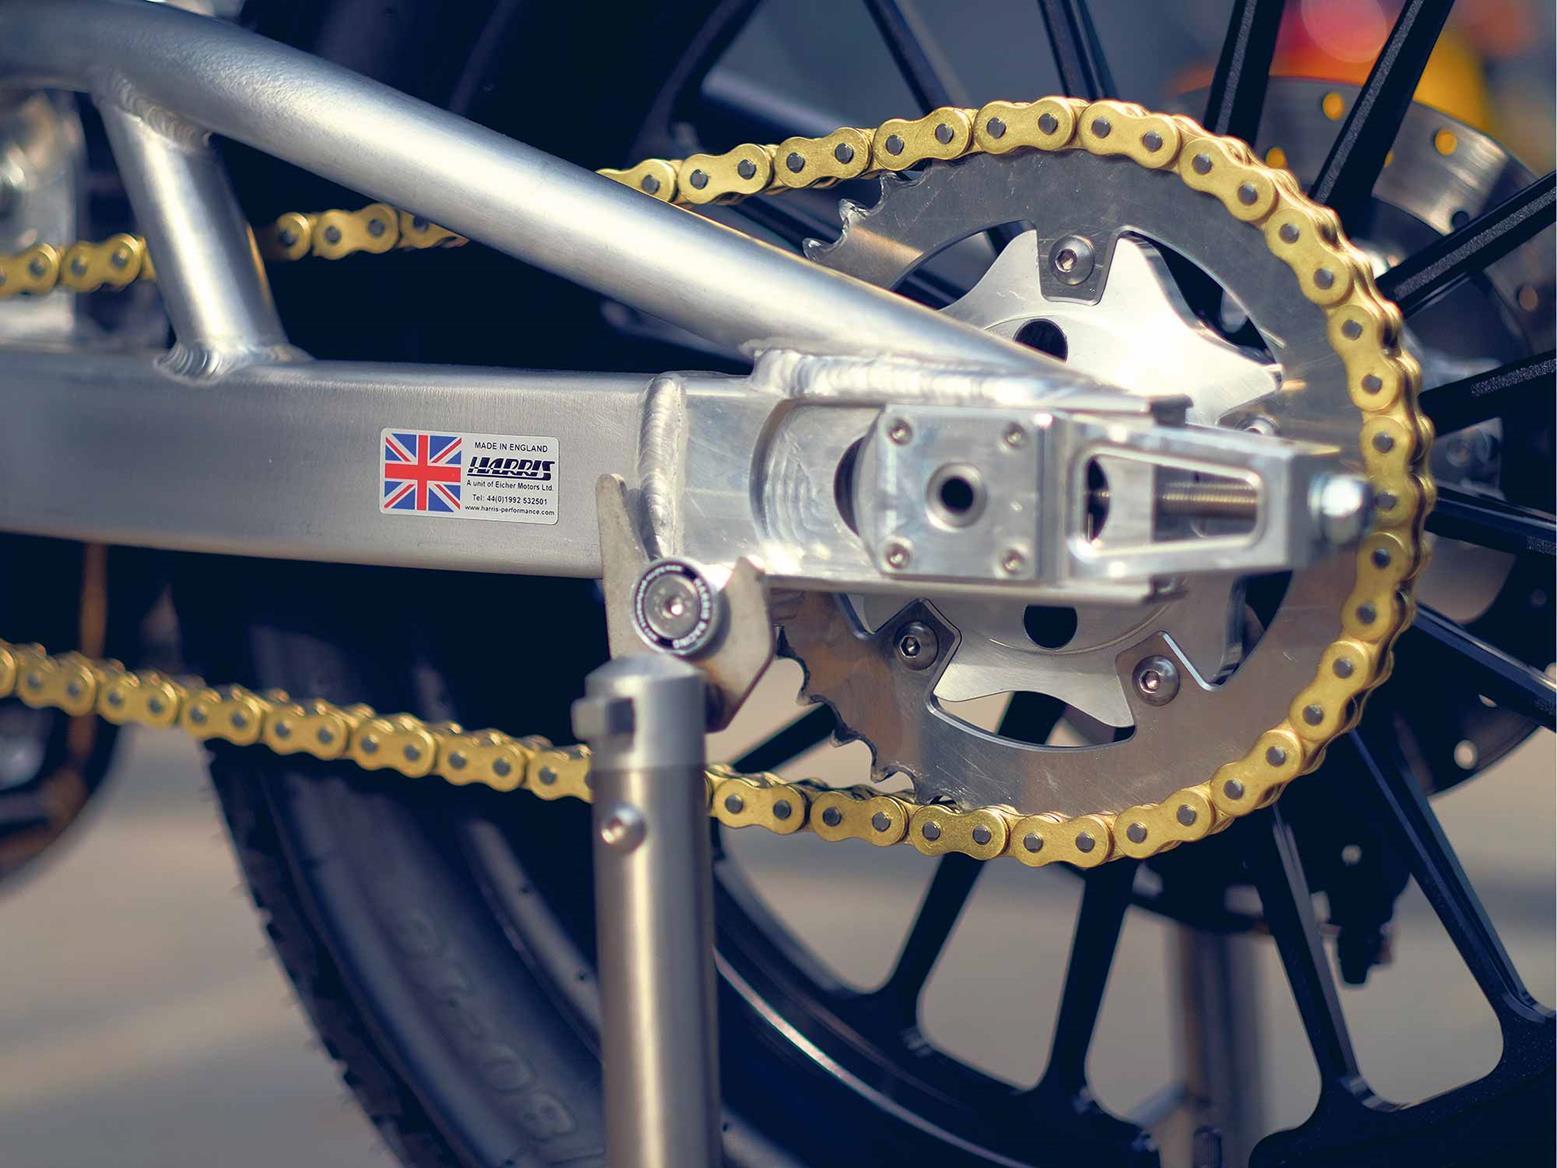 Royal Enfield flattracker chain and sprocket